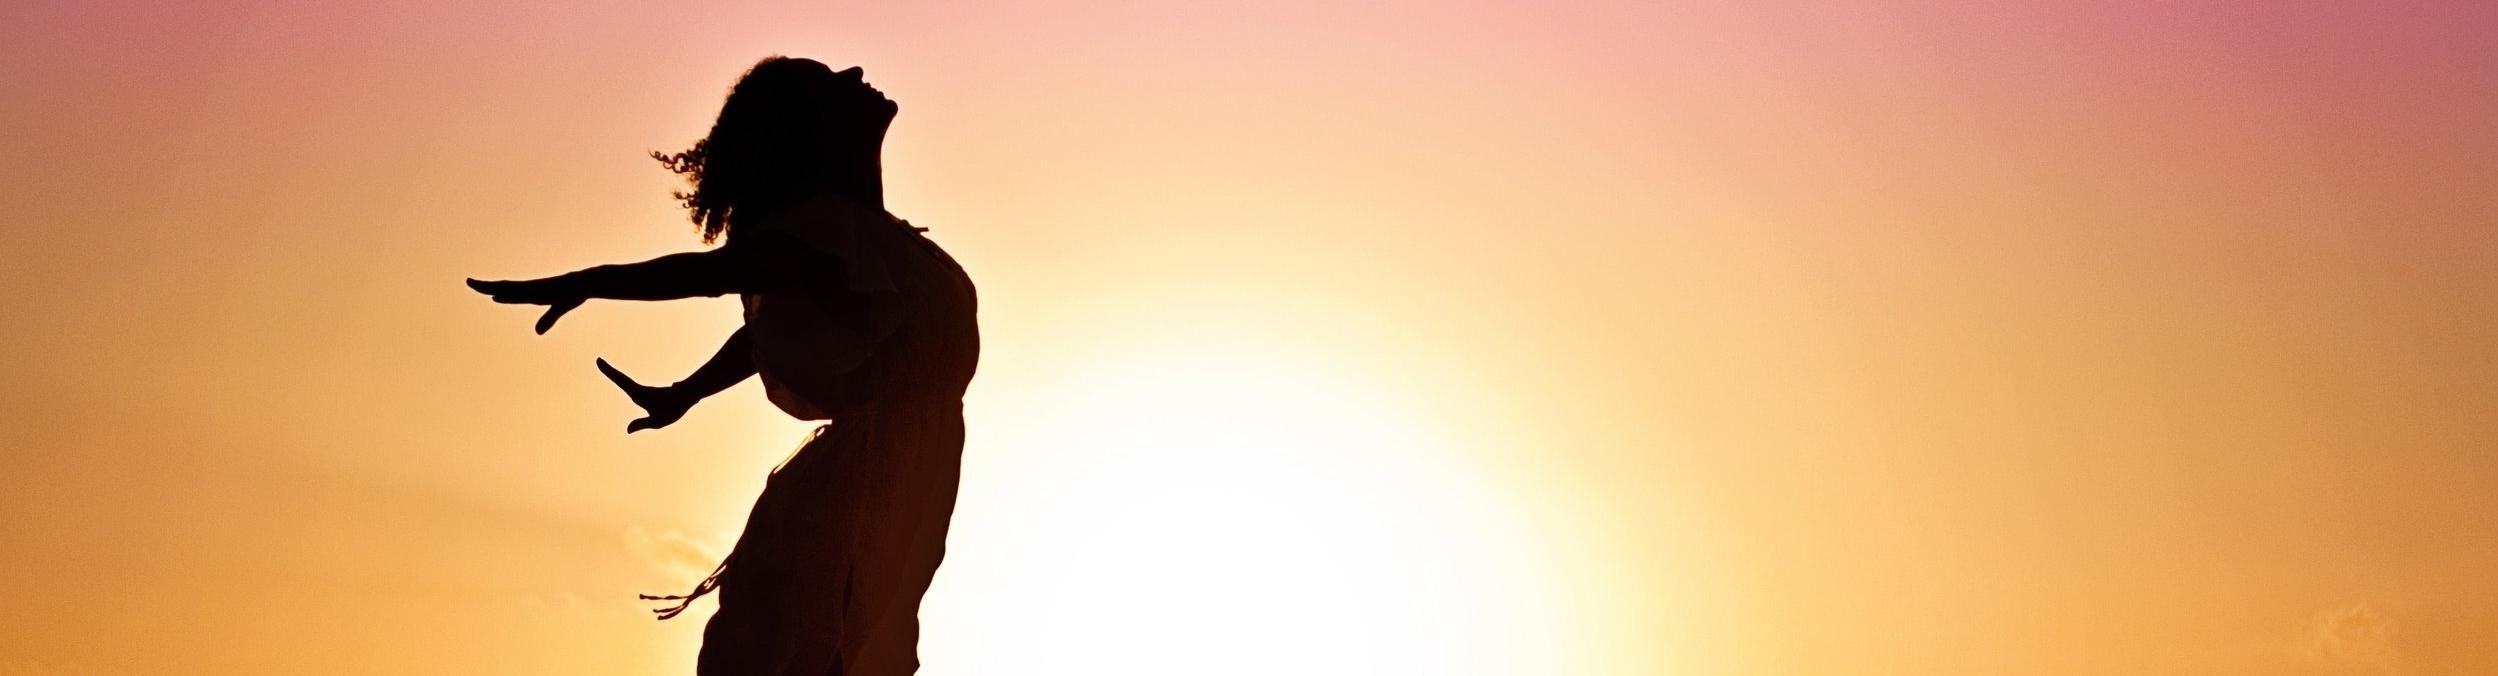 woman-happiness-sunrise-silhouette-40192.jpeg